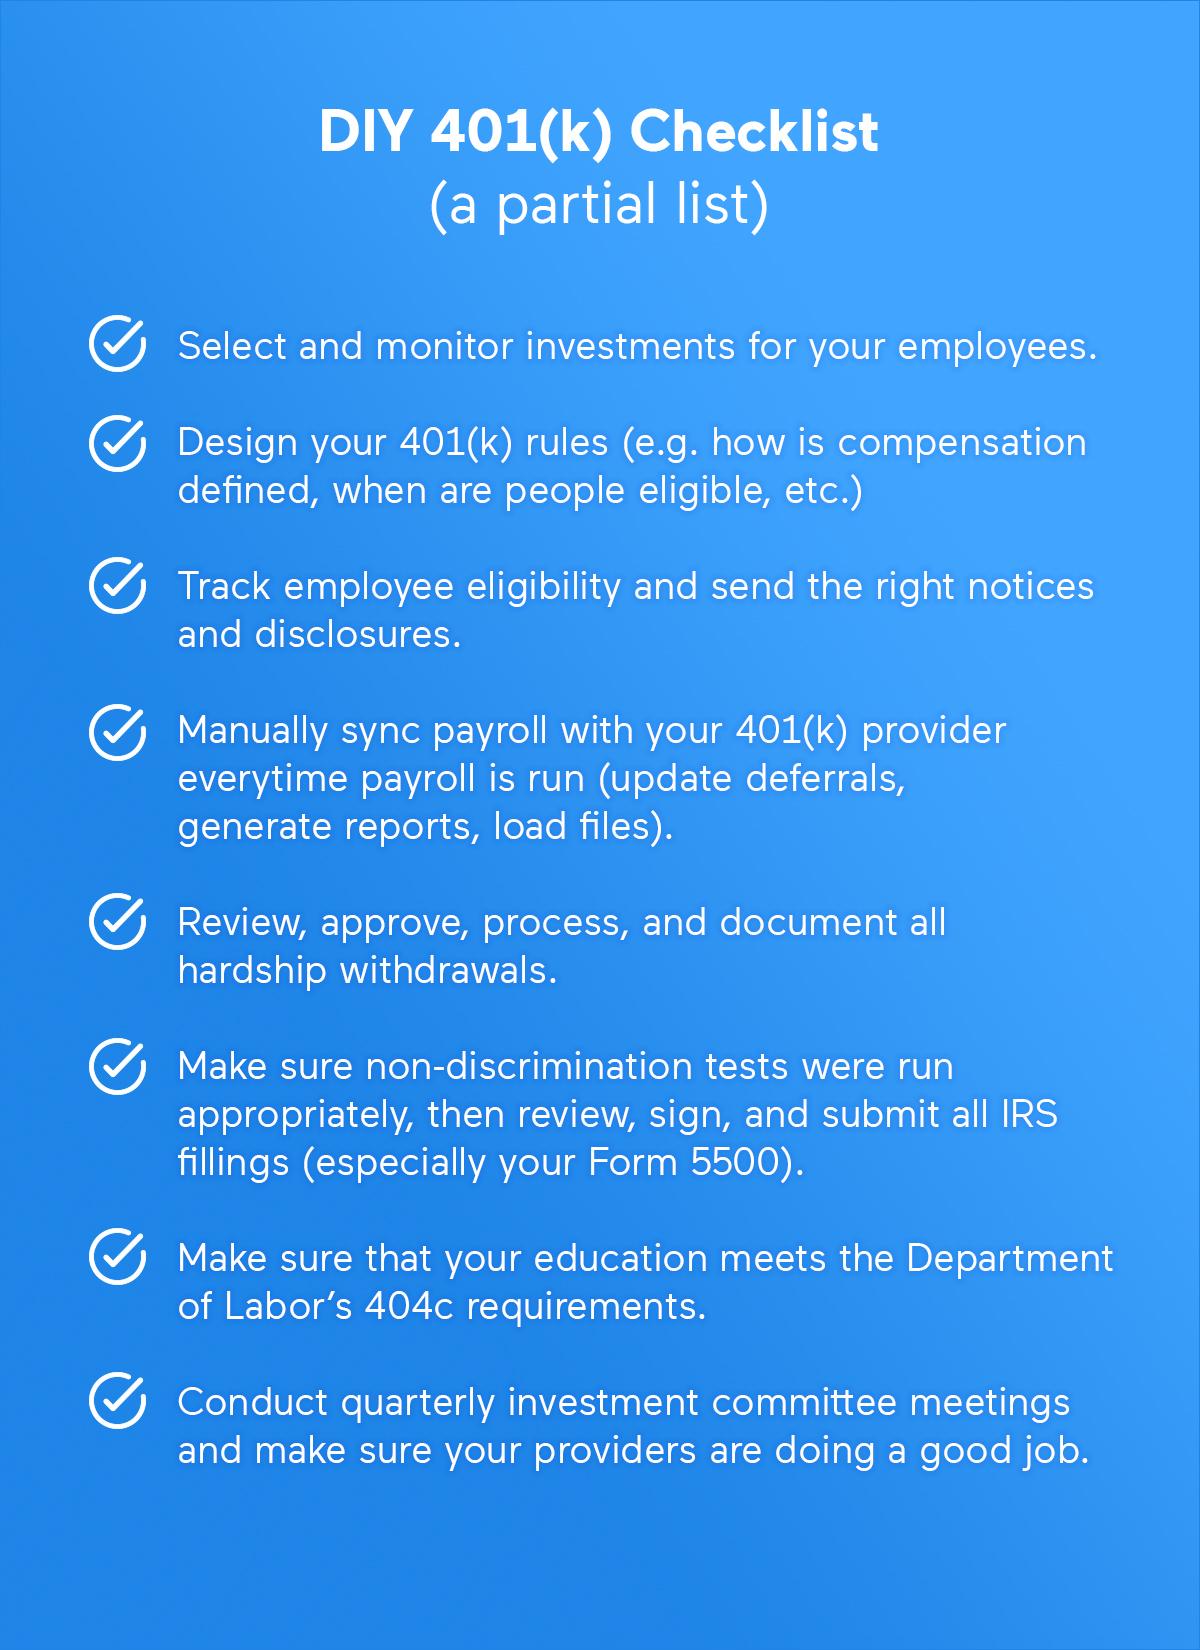 new-diy-checklist-1